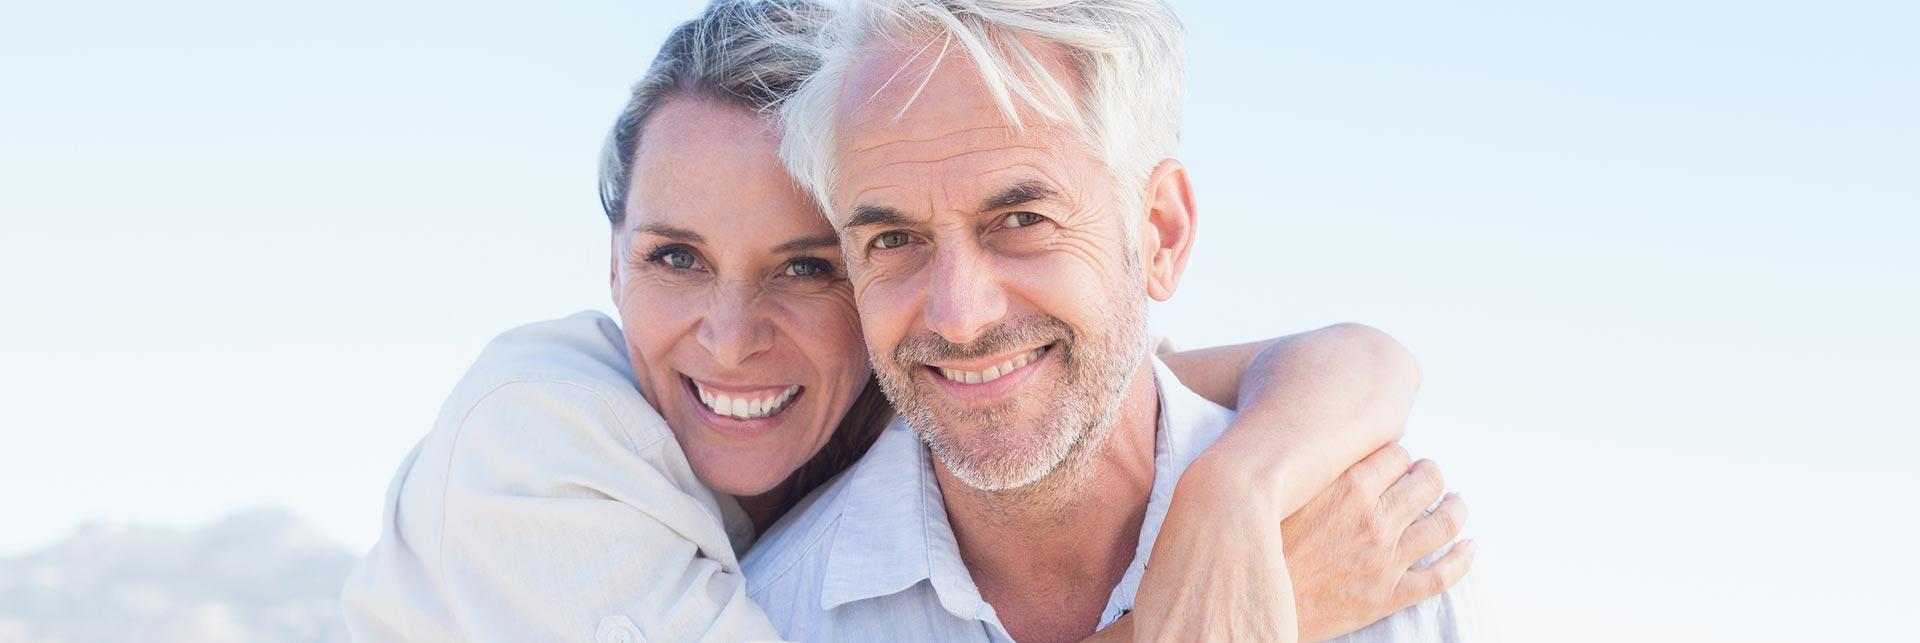 Dental Implant Restorations Odenton, MD